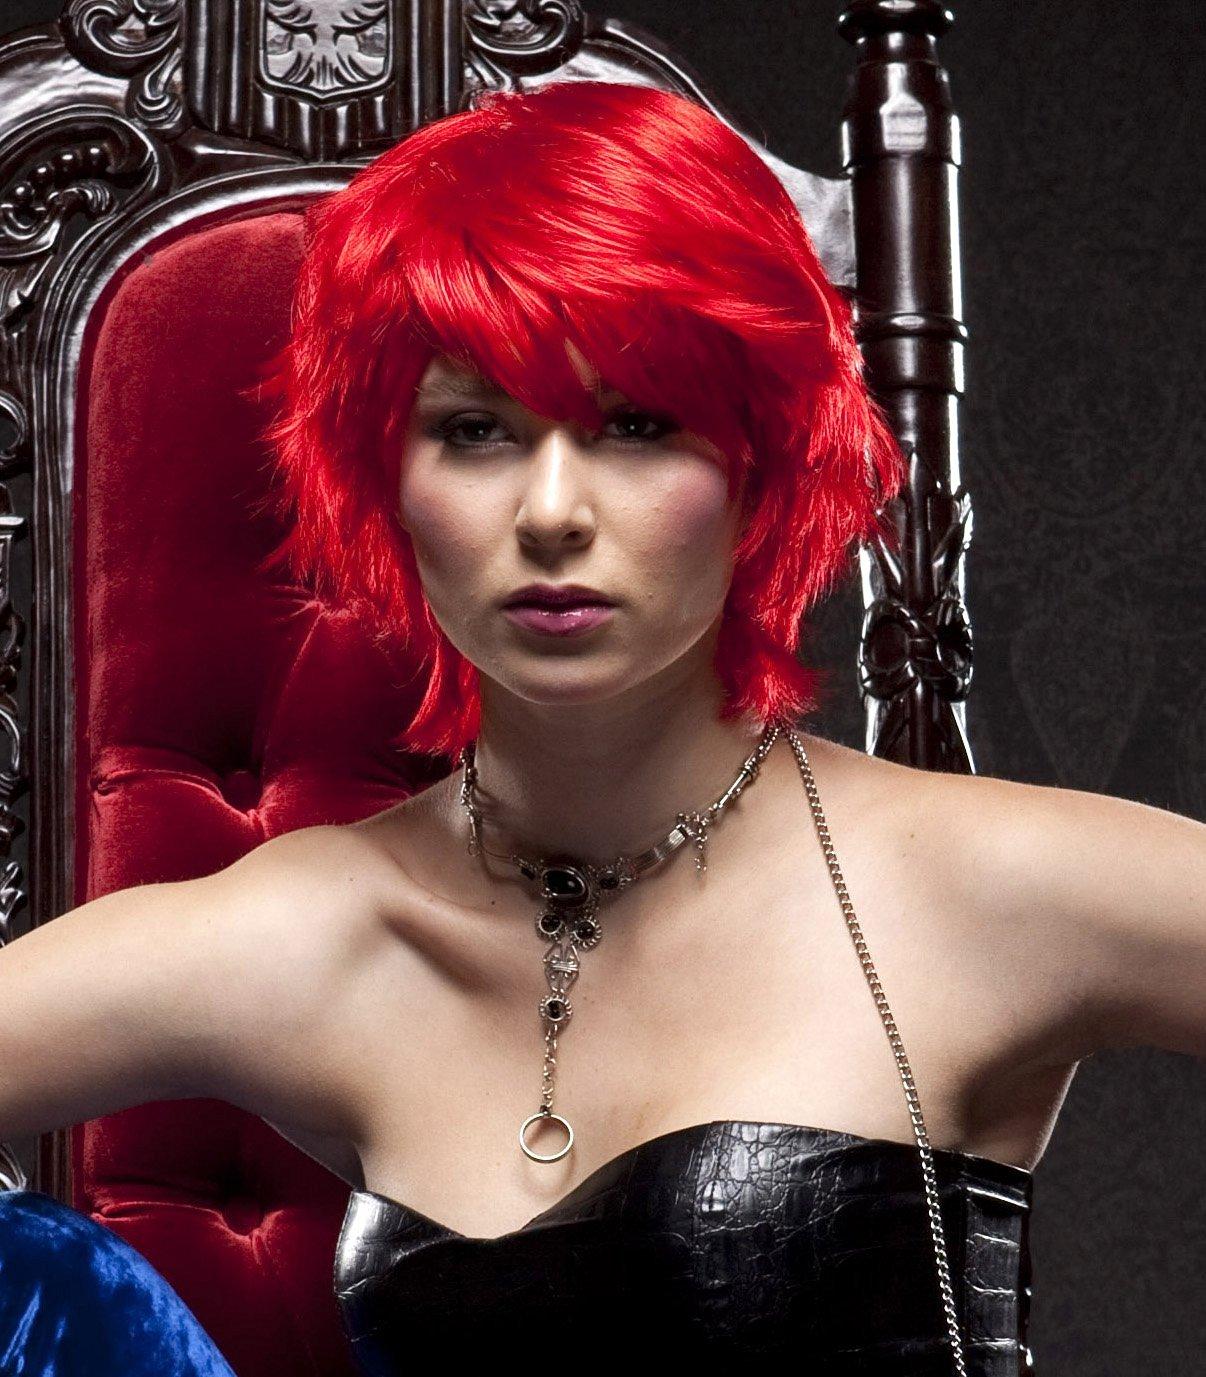 Modern RED Short Hair wigs for Women-Short hair Wigs for Black Women-Sexy Short wigs with bangs-Nicki Minaj,Vanessa Wig,Khloe Kardashia wig style type-Use Wig cap,wig stand,wig head and wig brush